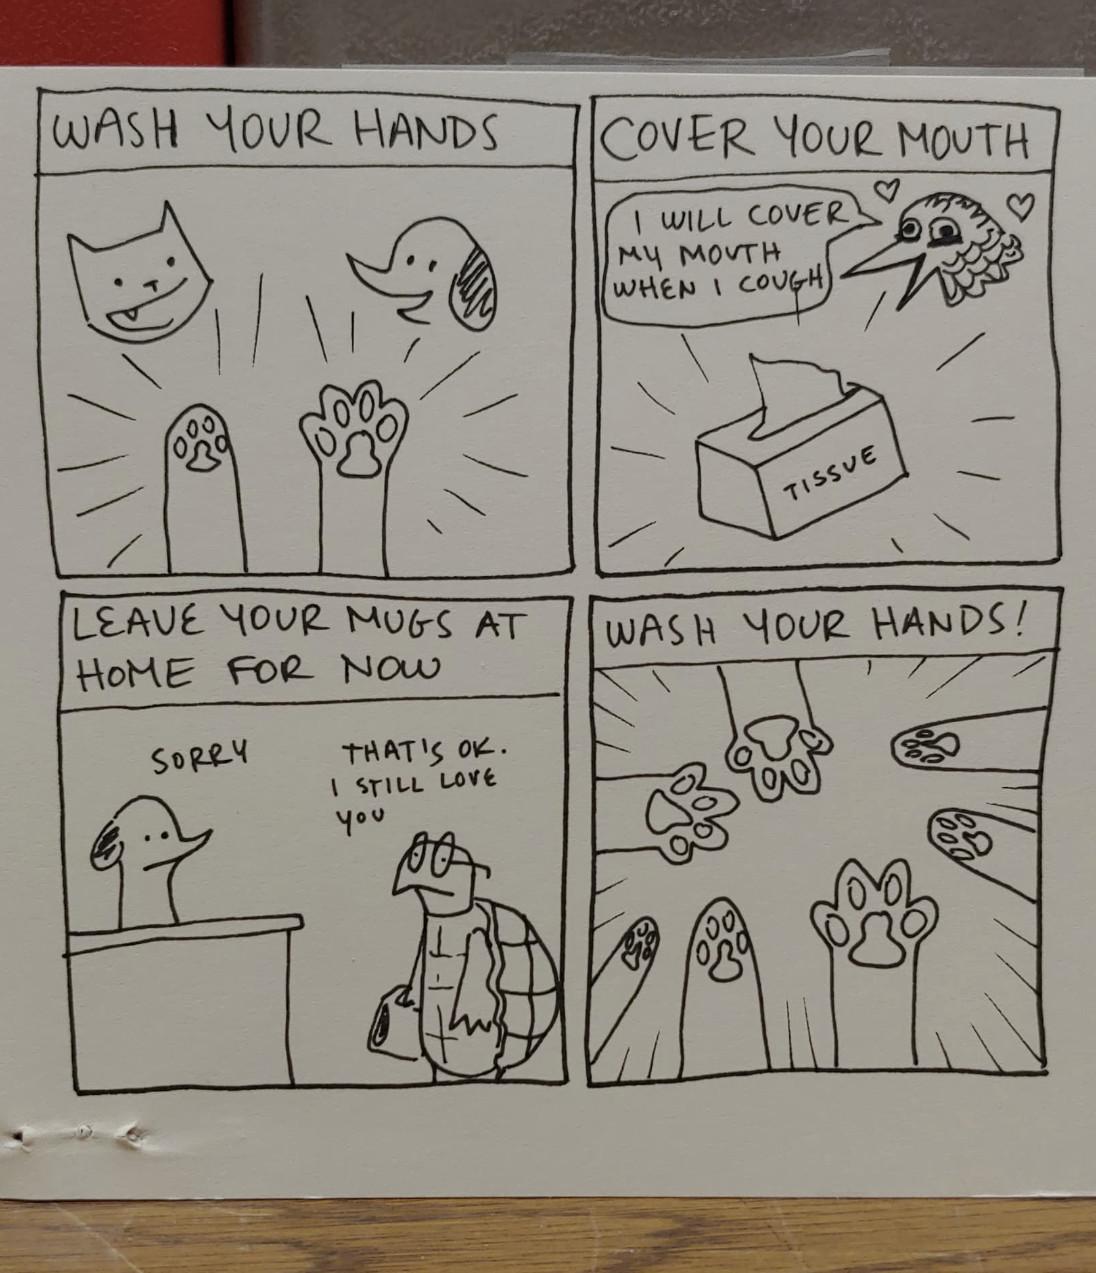 Epoch Coffee put up a cute comic encouraging general hygiene by illustrator NE Hensley